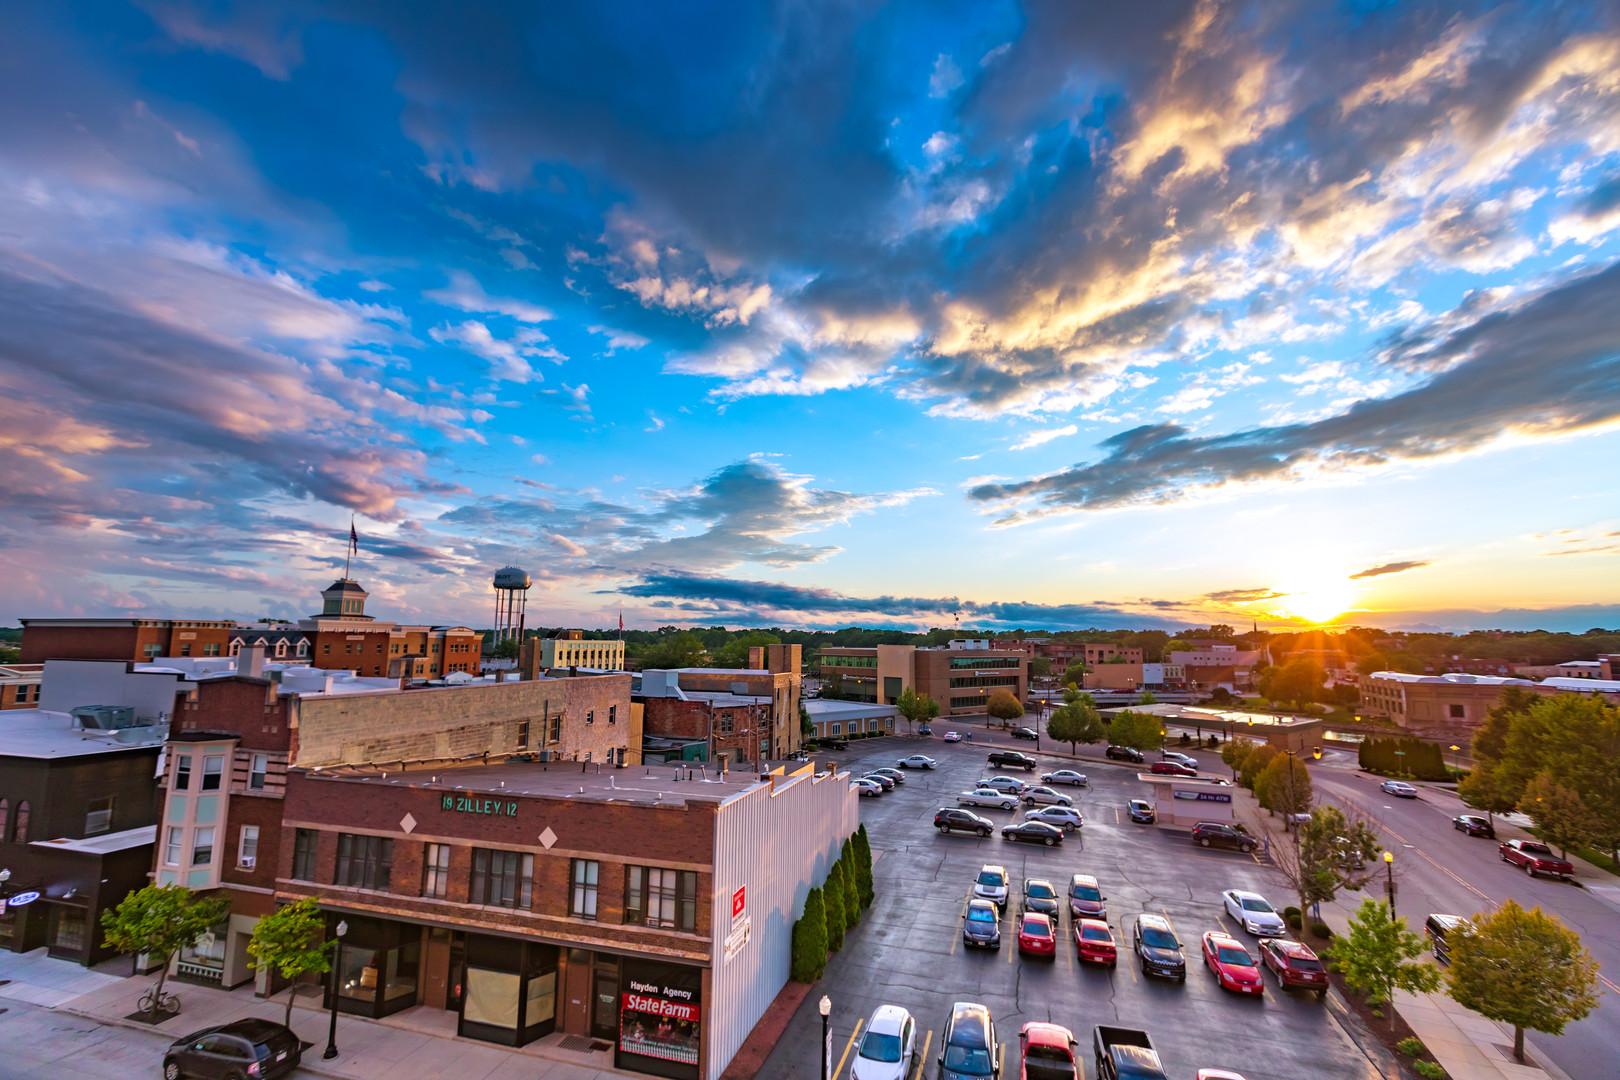 goowwin_rooftop_0041.jpg